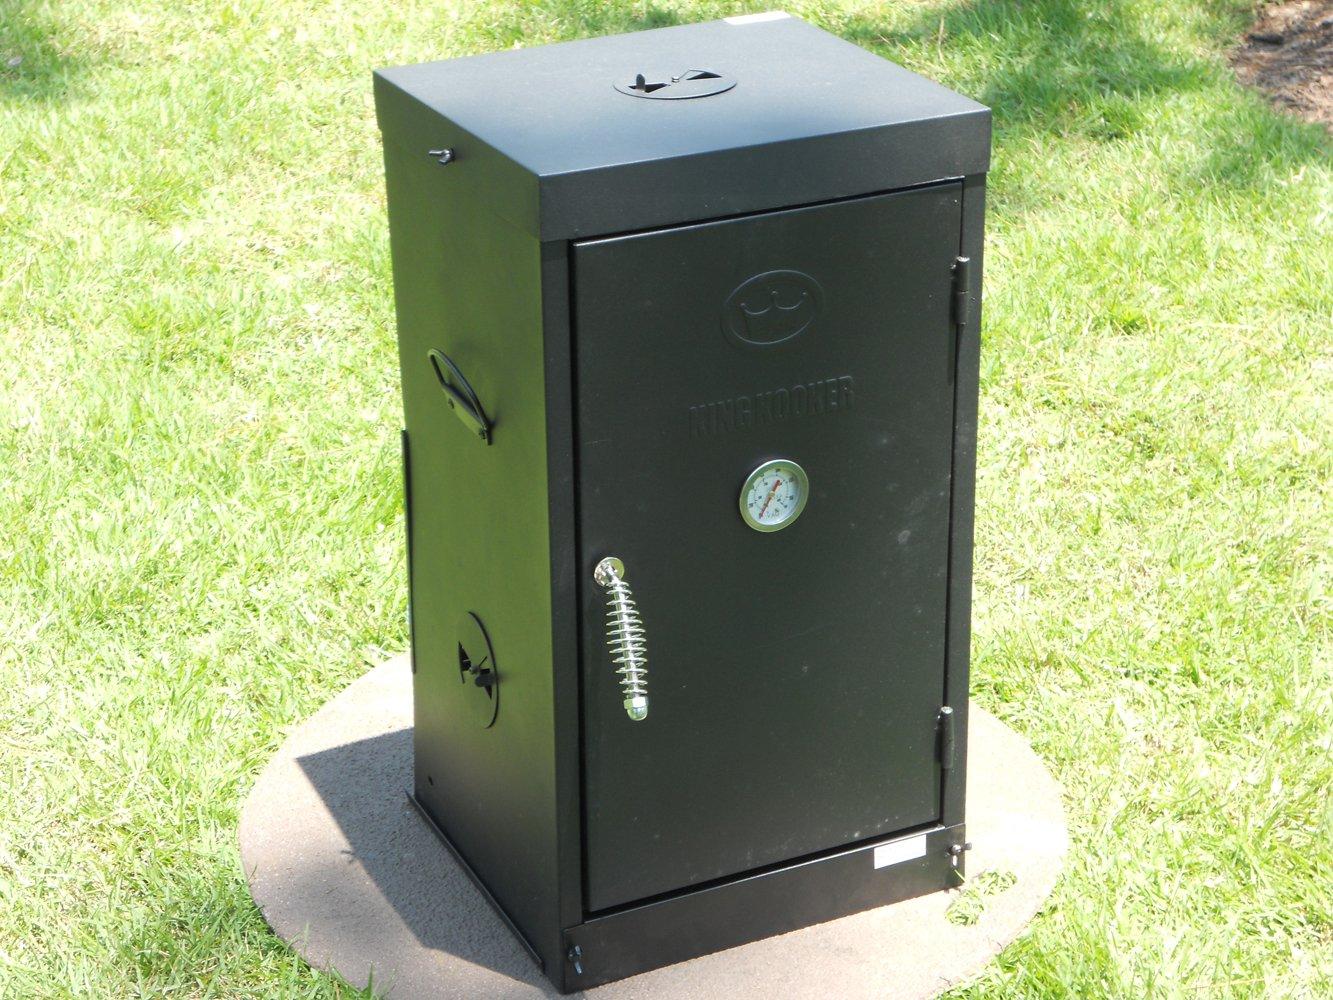 King Kooker 2607 Outdoor Chef's Smoker/Oven/Stove